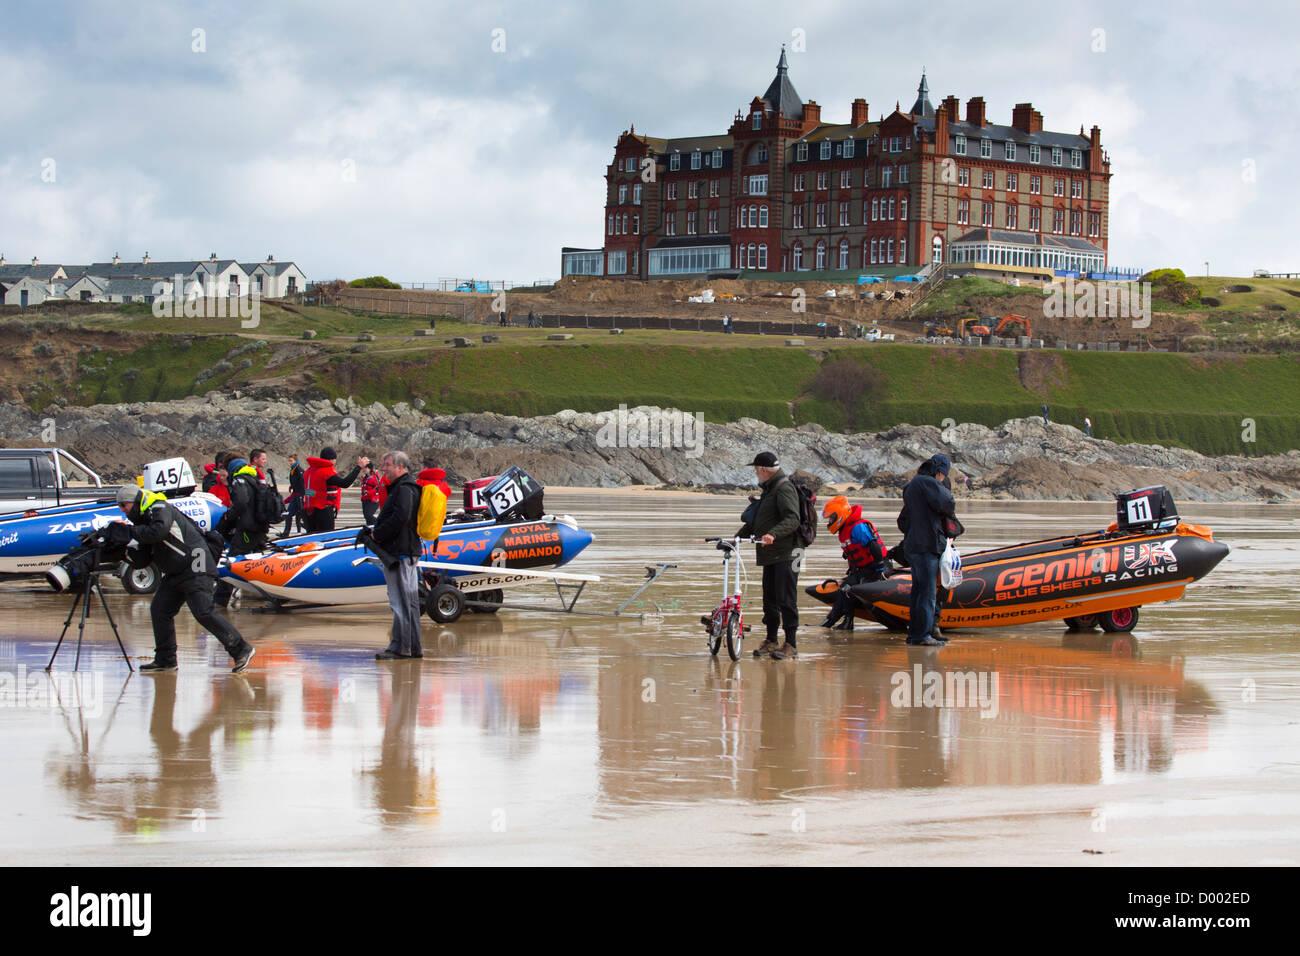 Zapcat; Power Boats; Newquay; Cornwall; UK - Stock Image